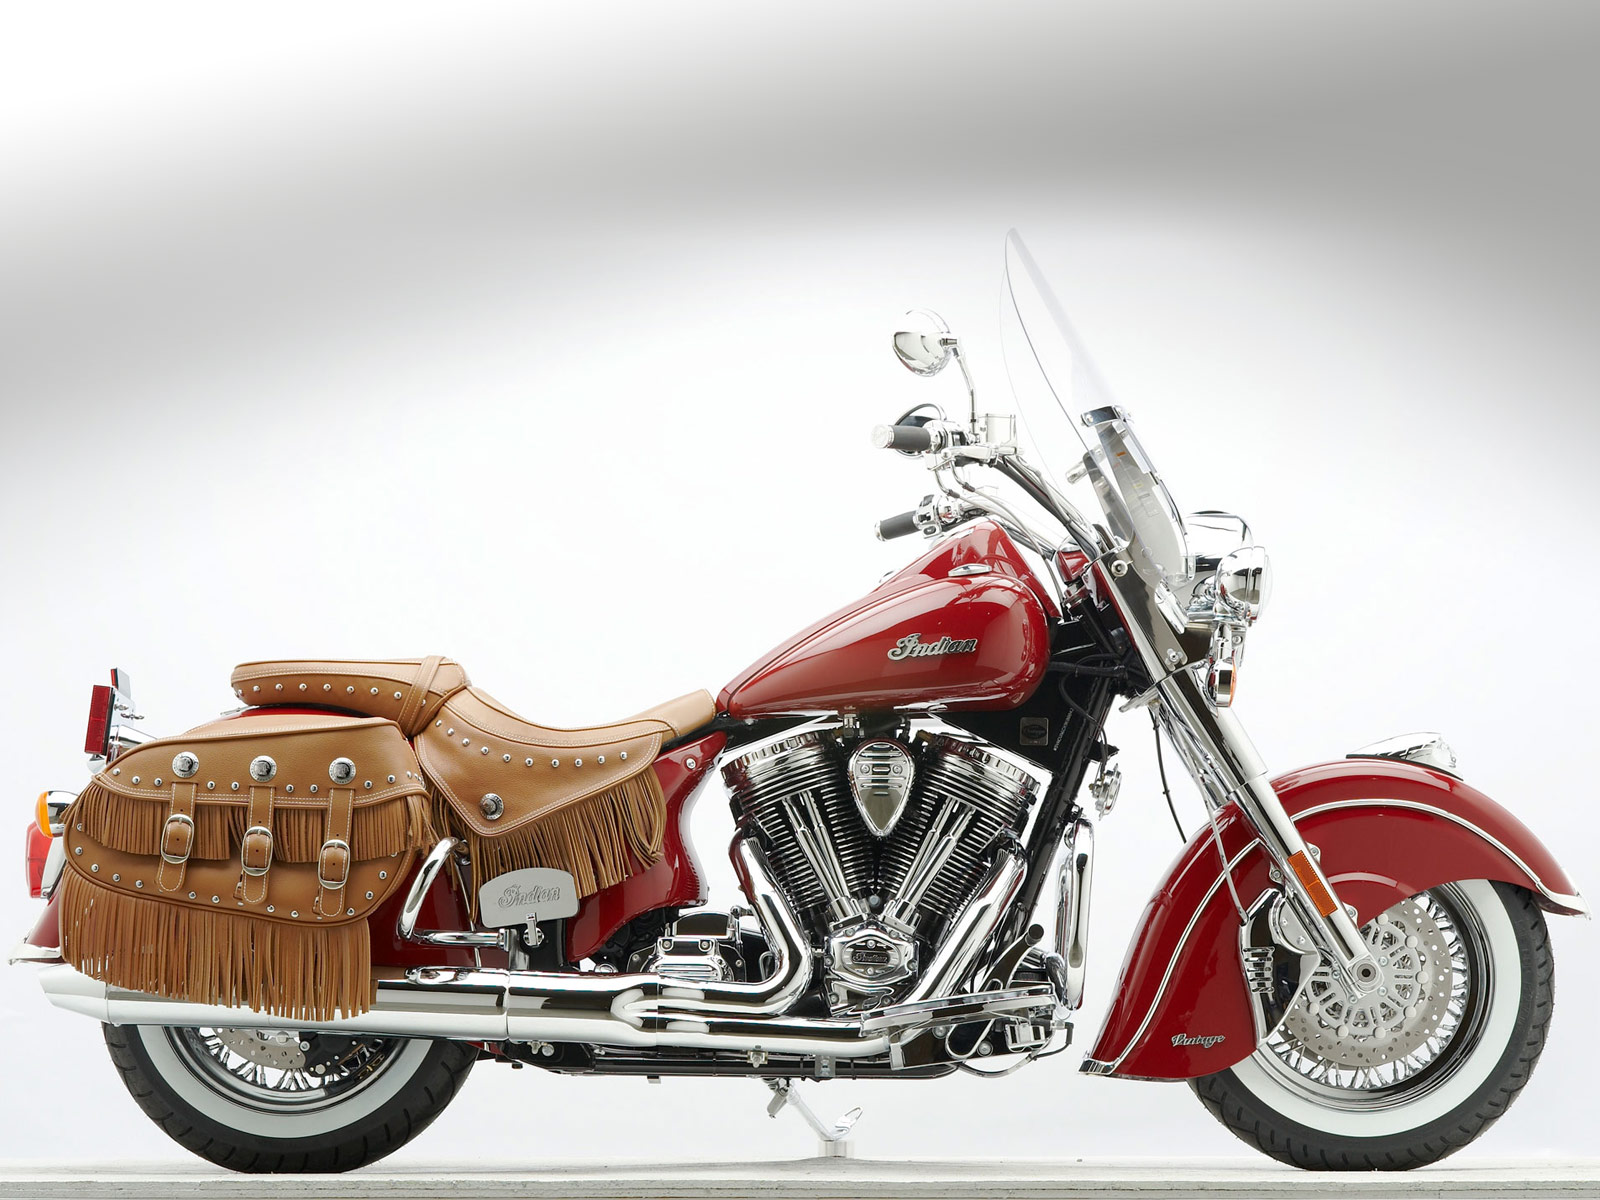 Ducati Monster 696 2012 Indian Chief Vintage Motorcycle